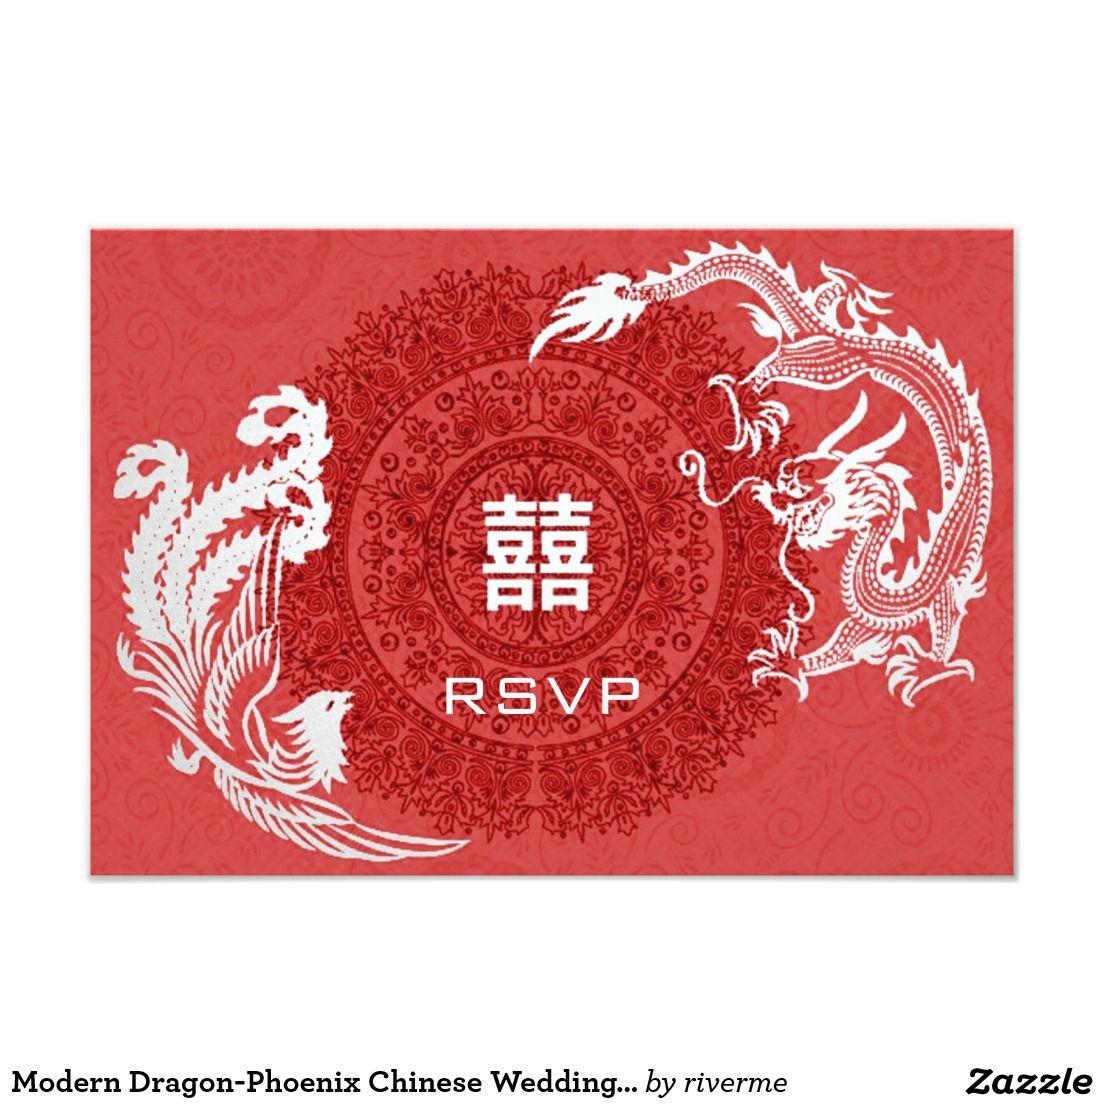 Modern Dragon-Phoenix Chinese Wedding RSVP Card | Graphic Design ...